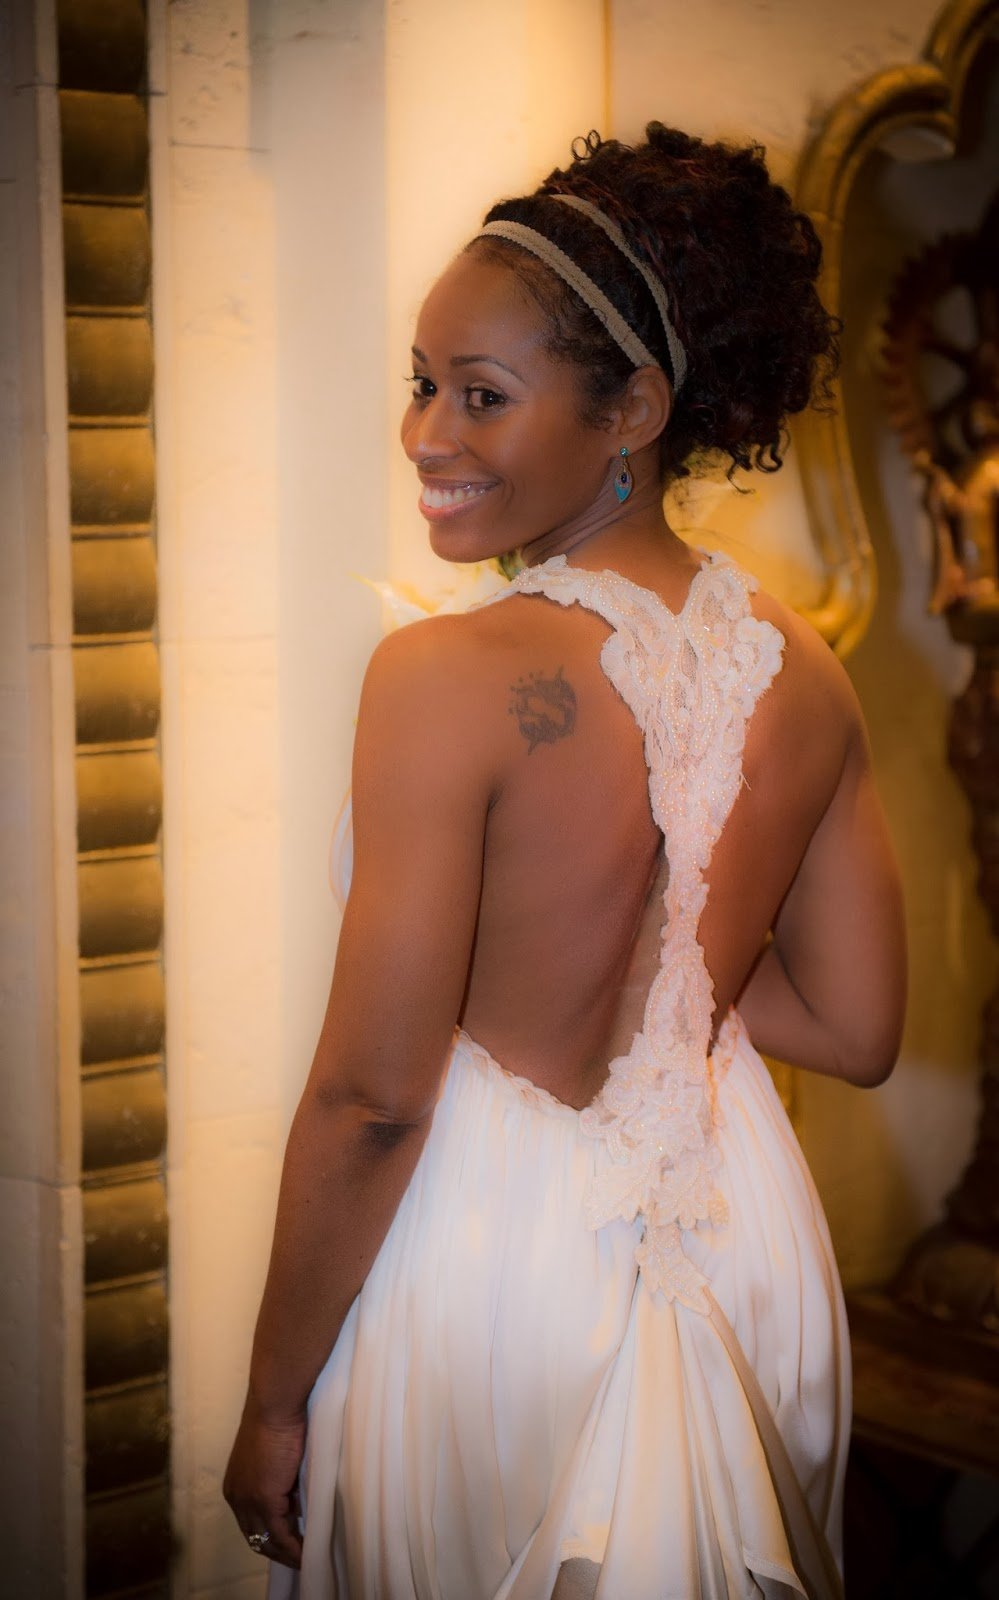 Shelli of Hairscapades- A Wedding Story